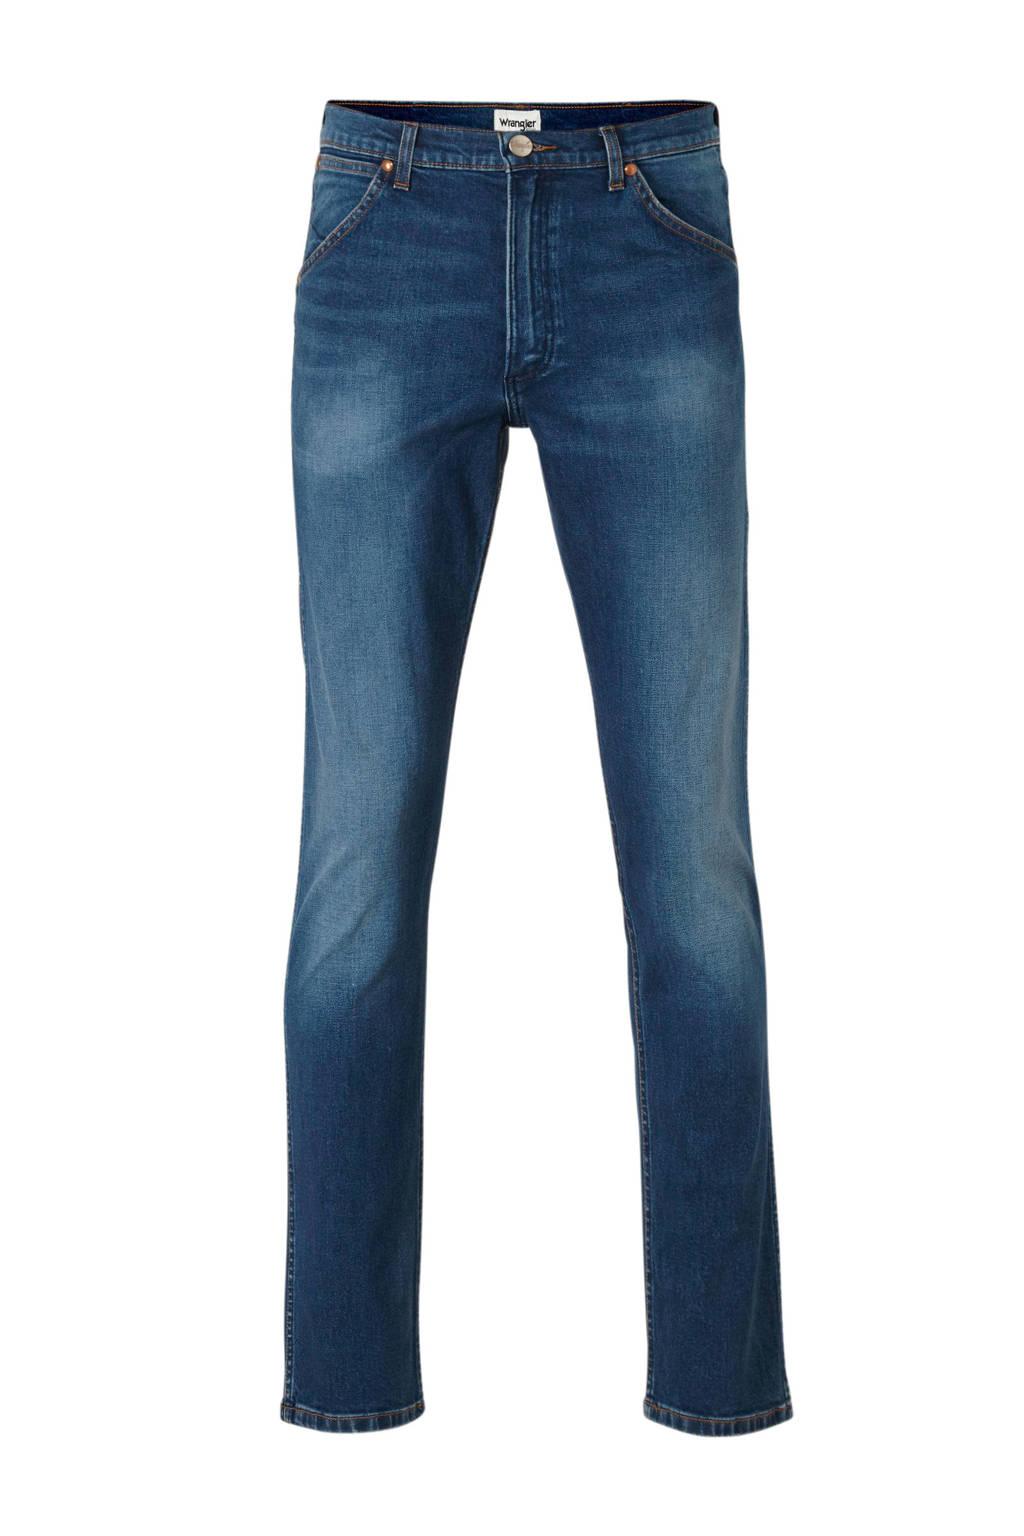 Wrangler slim fit jeans 11MWZ 1 YEAR, 1 Year